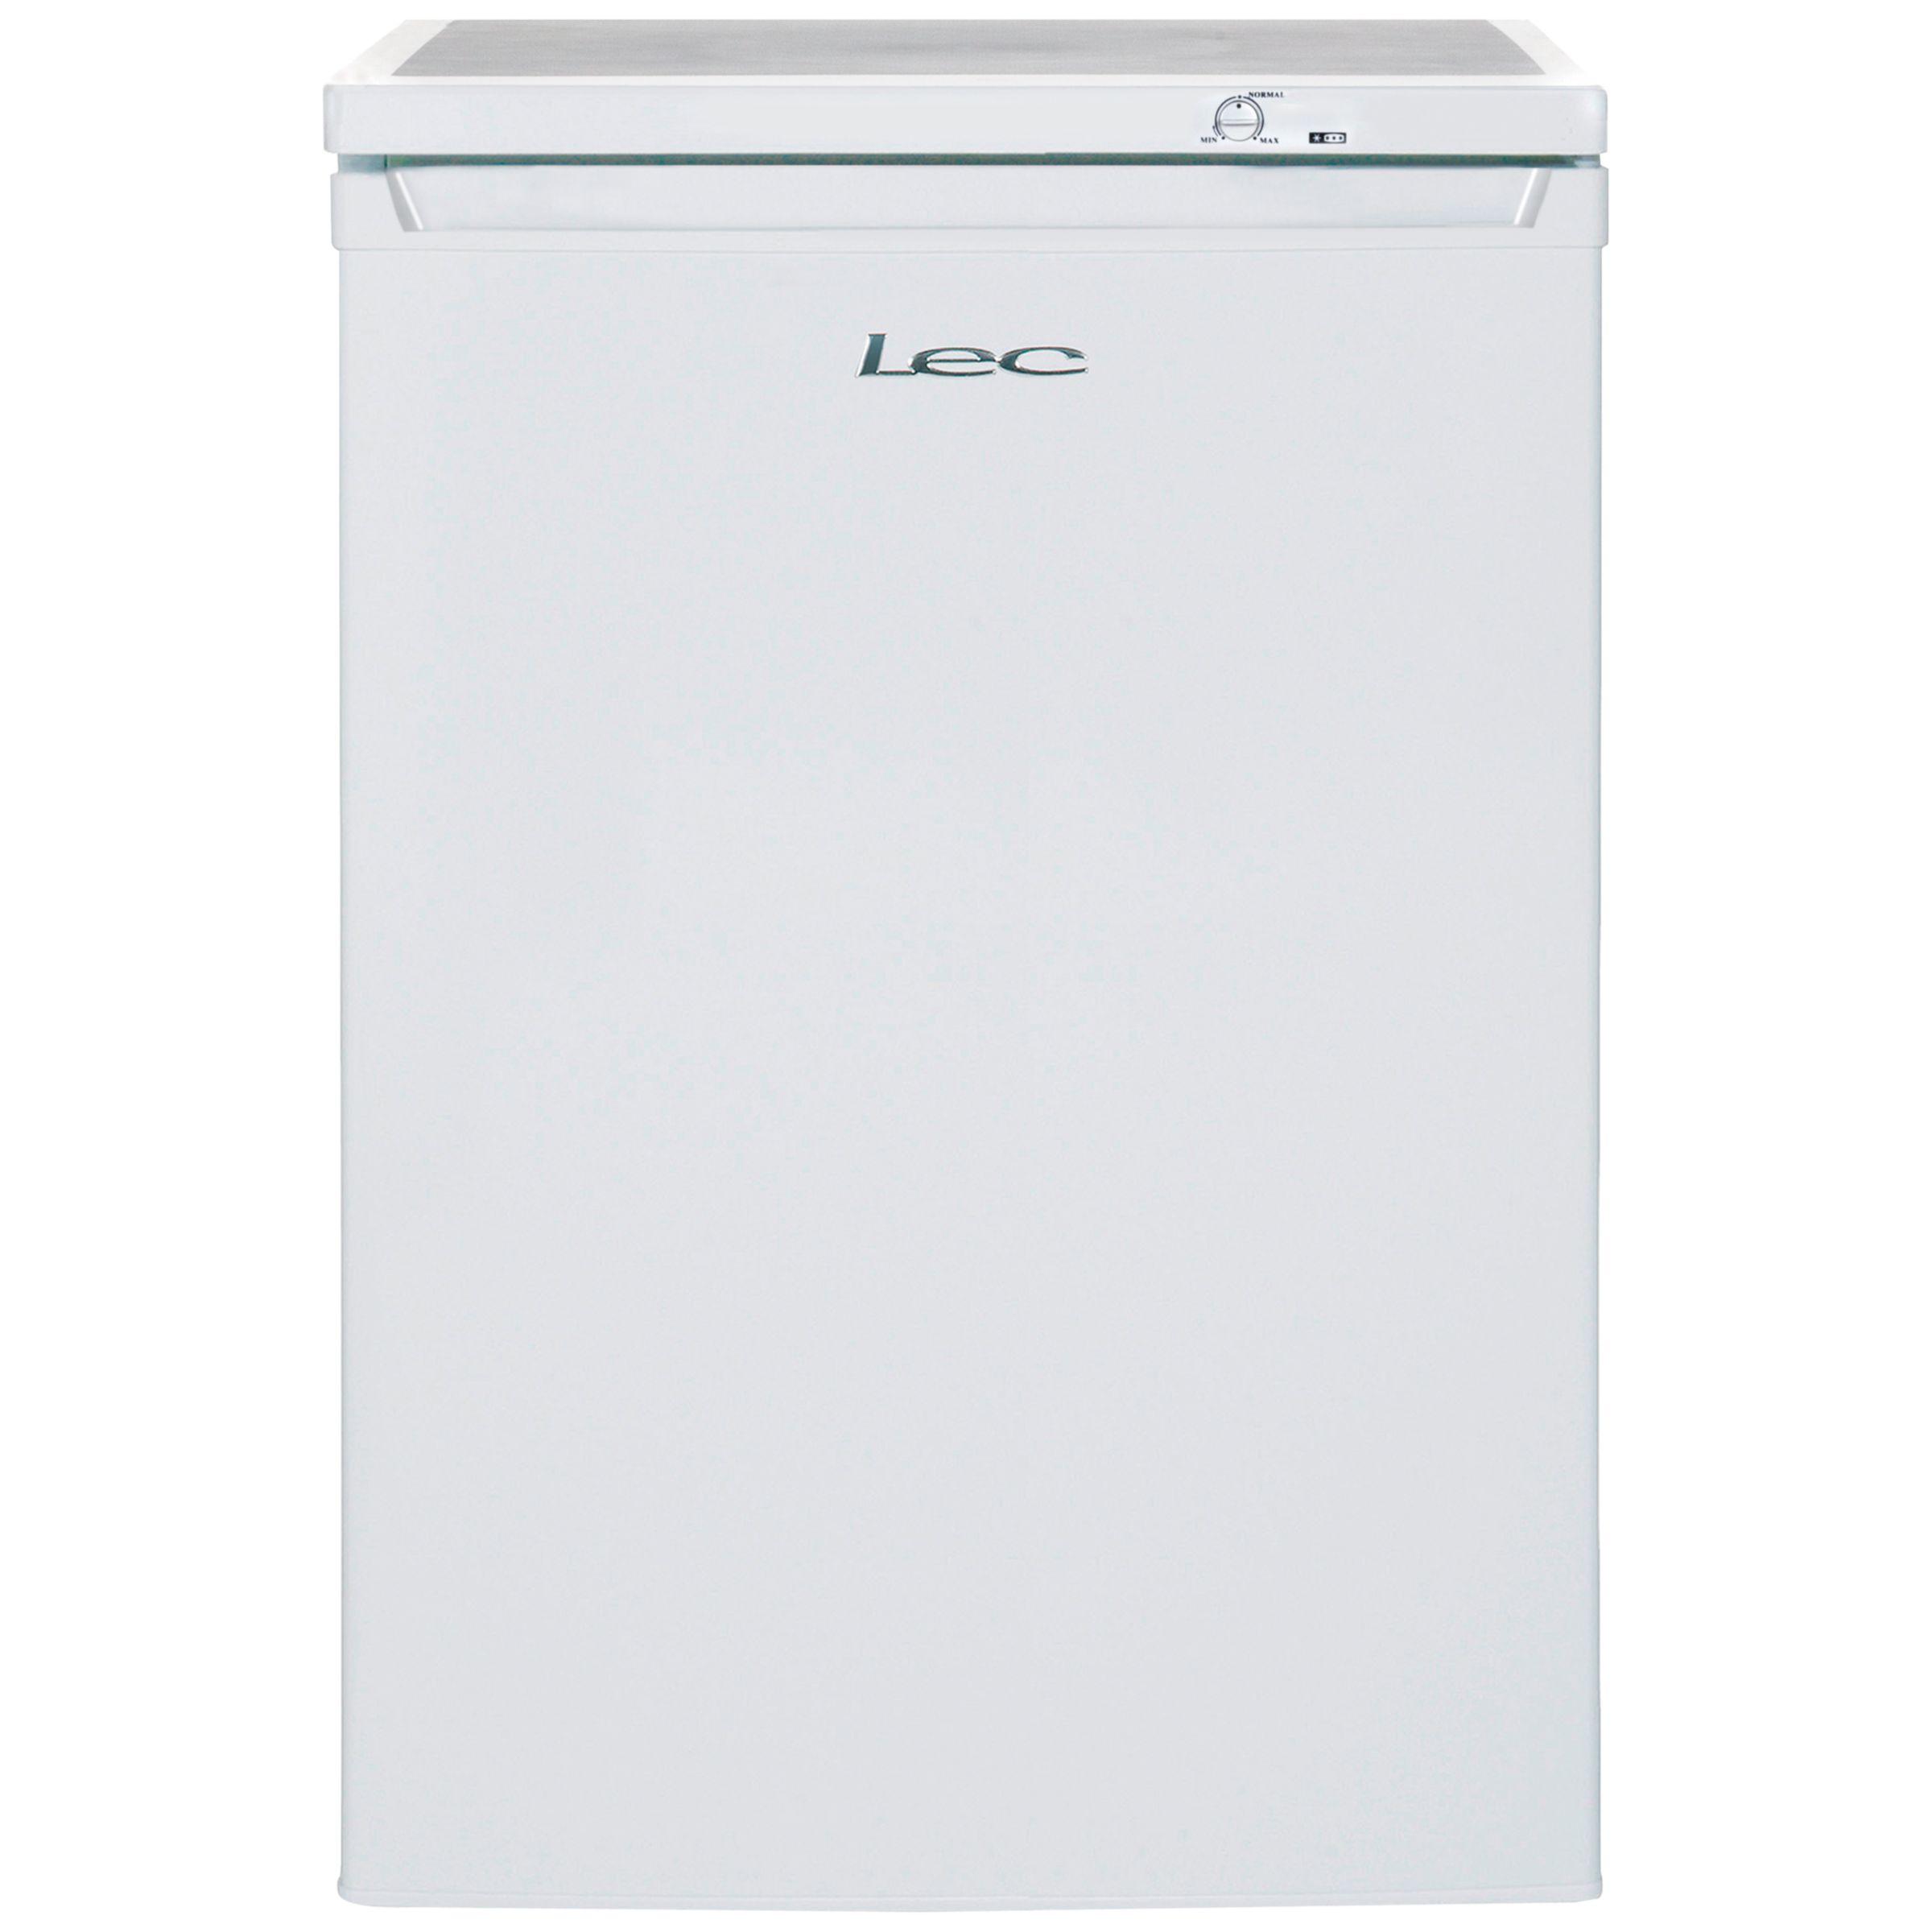 LEC Lec U6014W Freestanding Undercounter Freezer, A+ Energy Rating, 60cm Wide, White